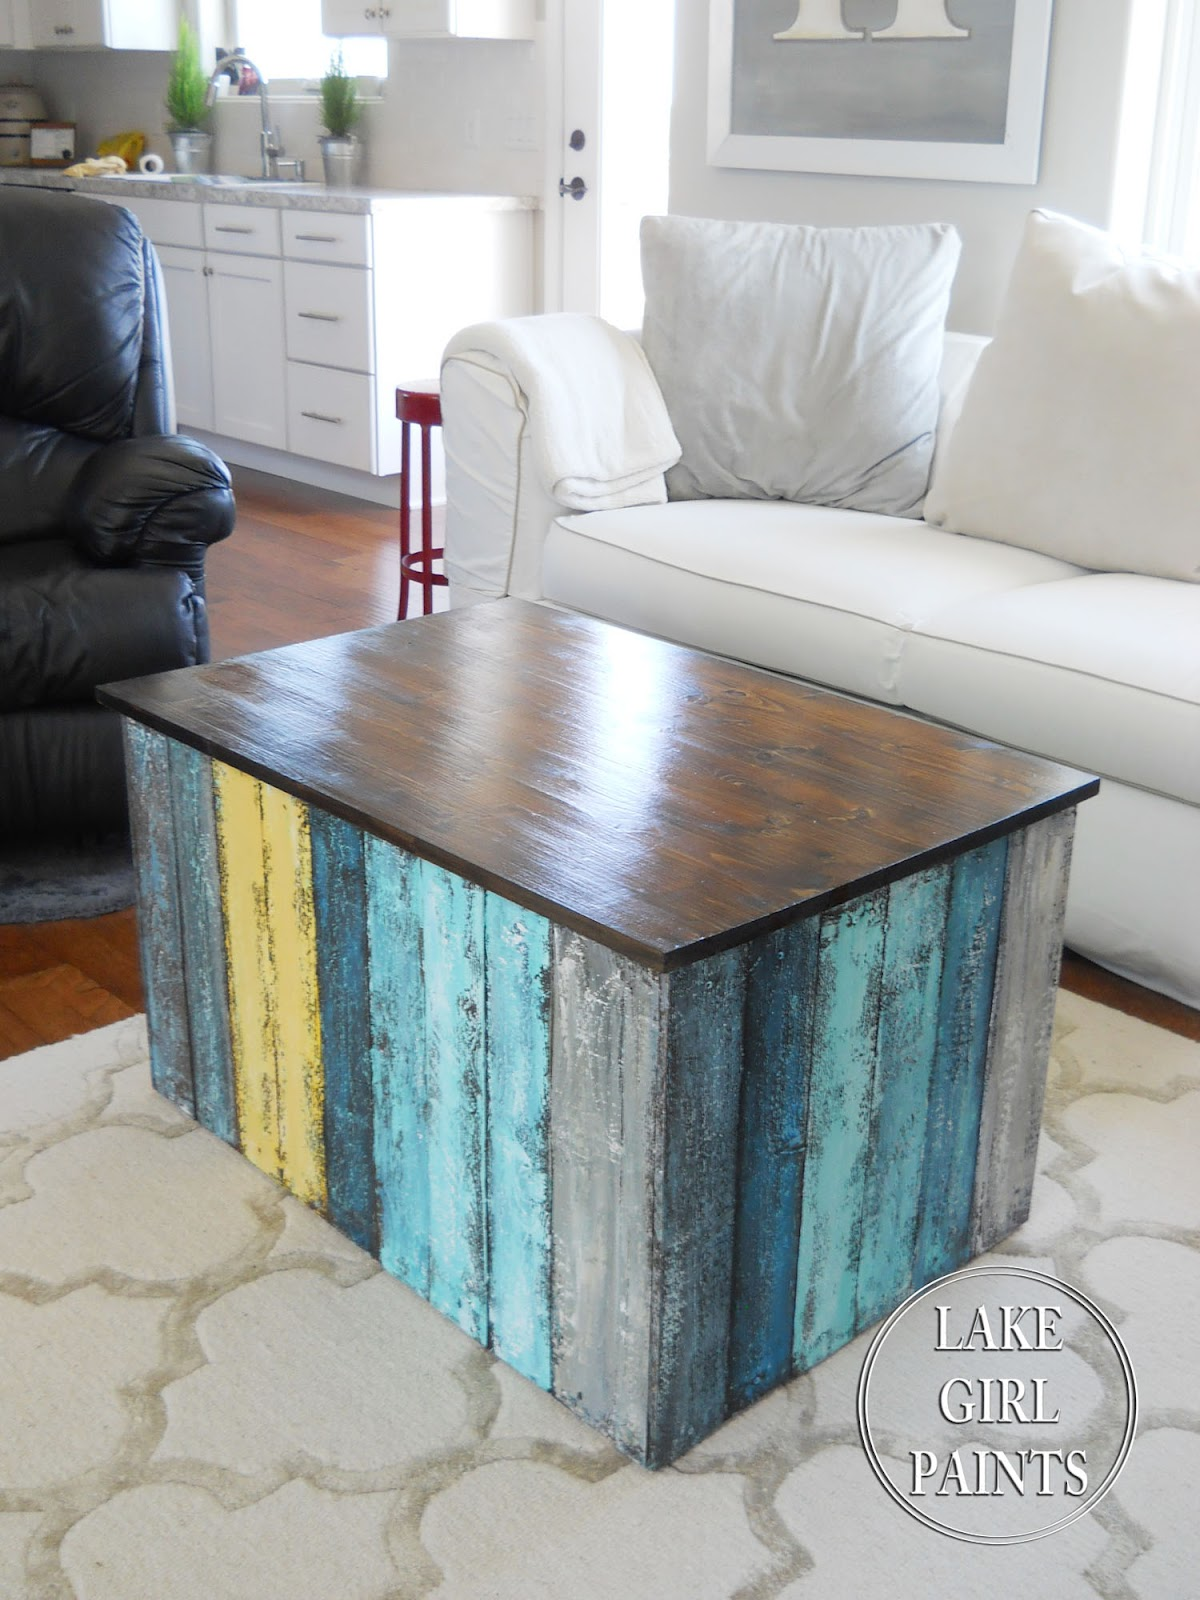 Lake Girl Paints Beach Box Coffee Table